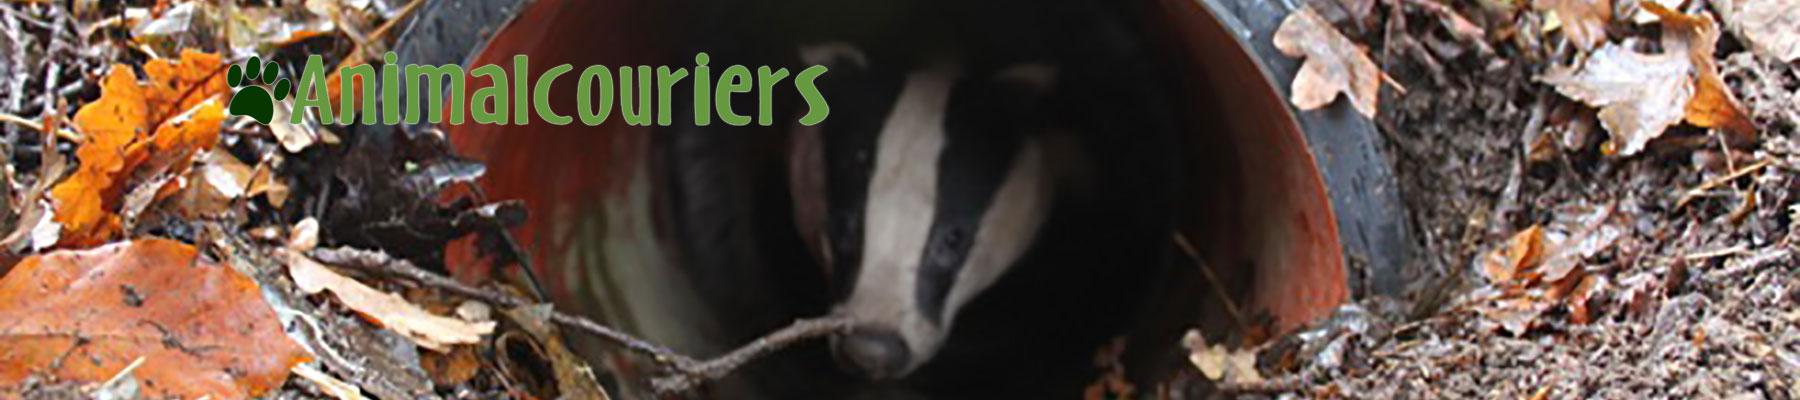 Badger release